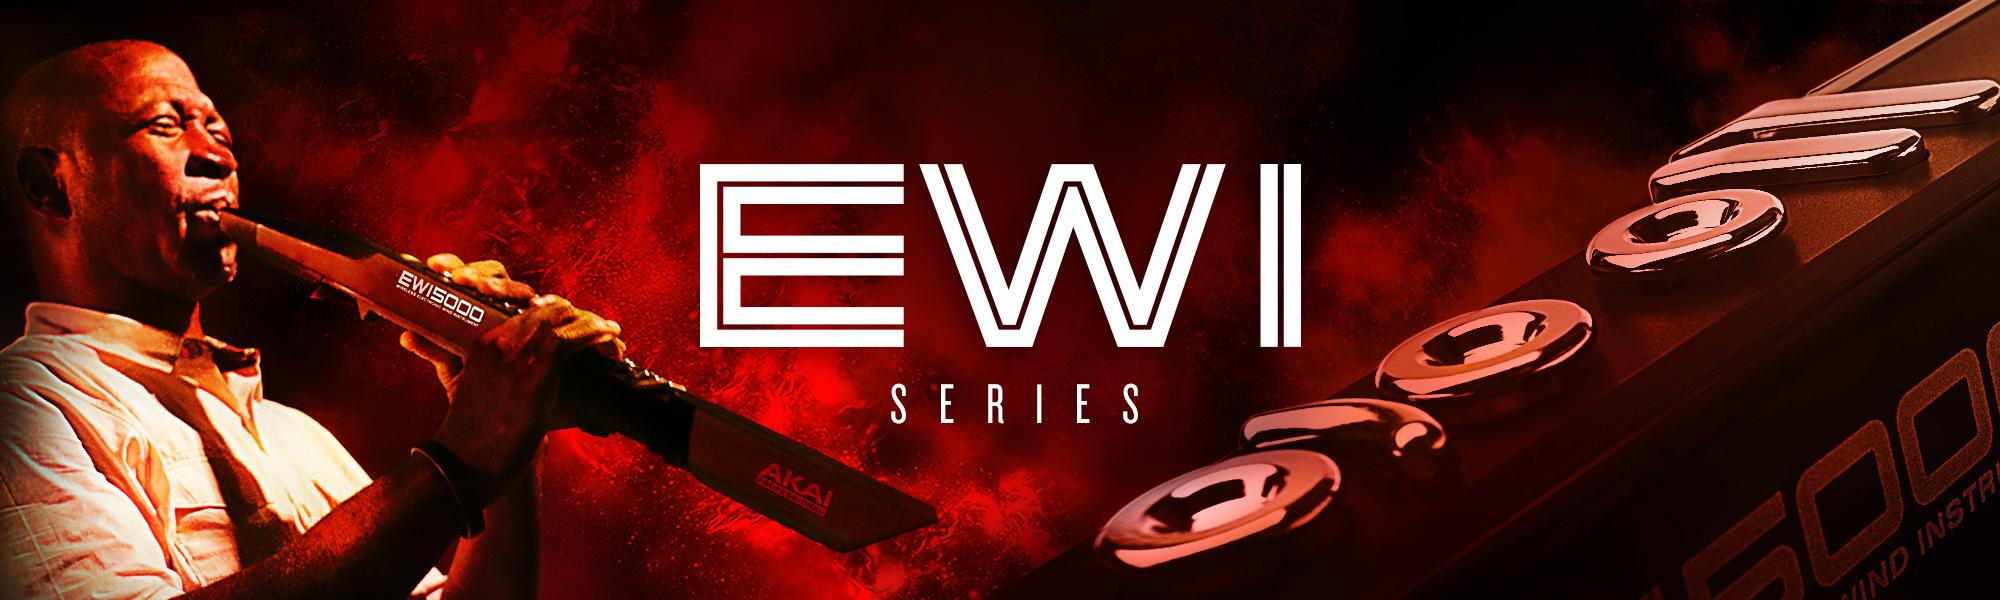 EWI Series